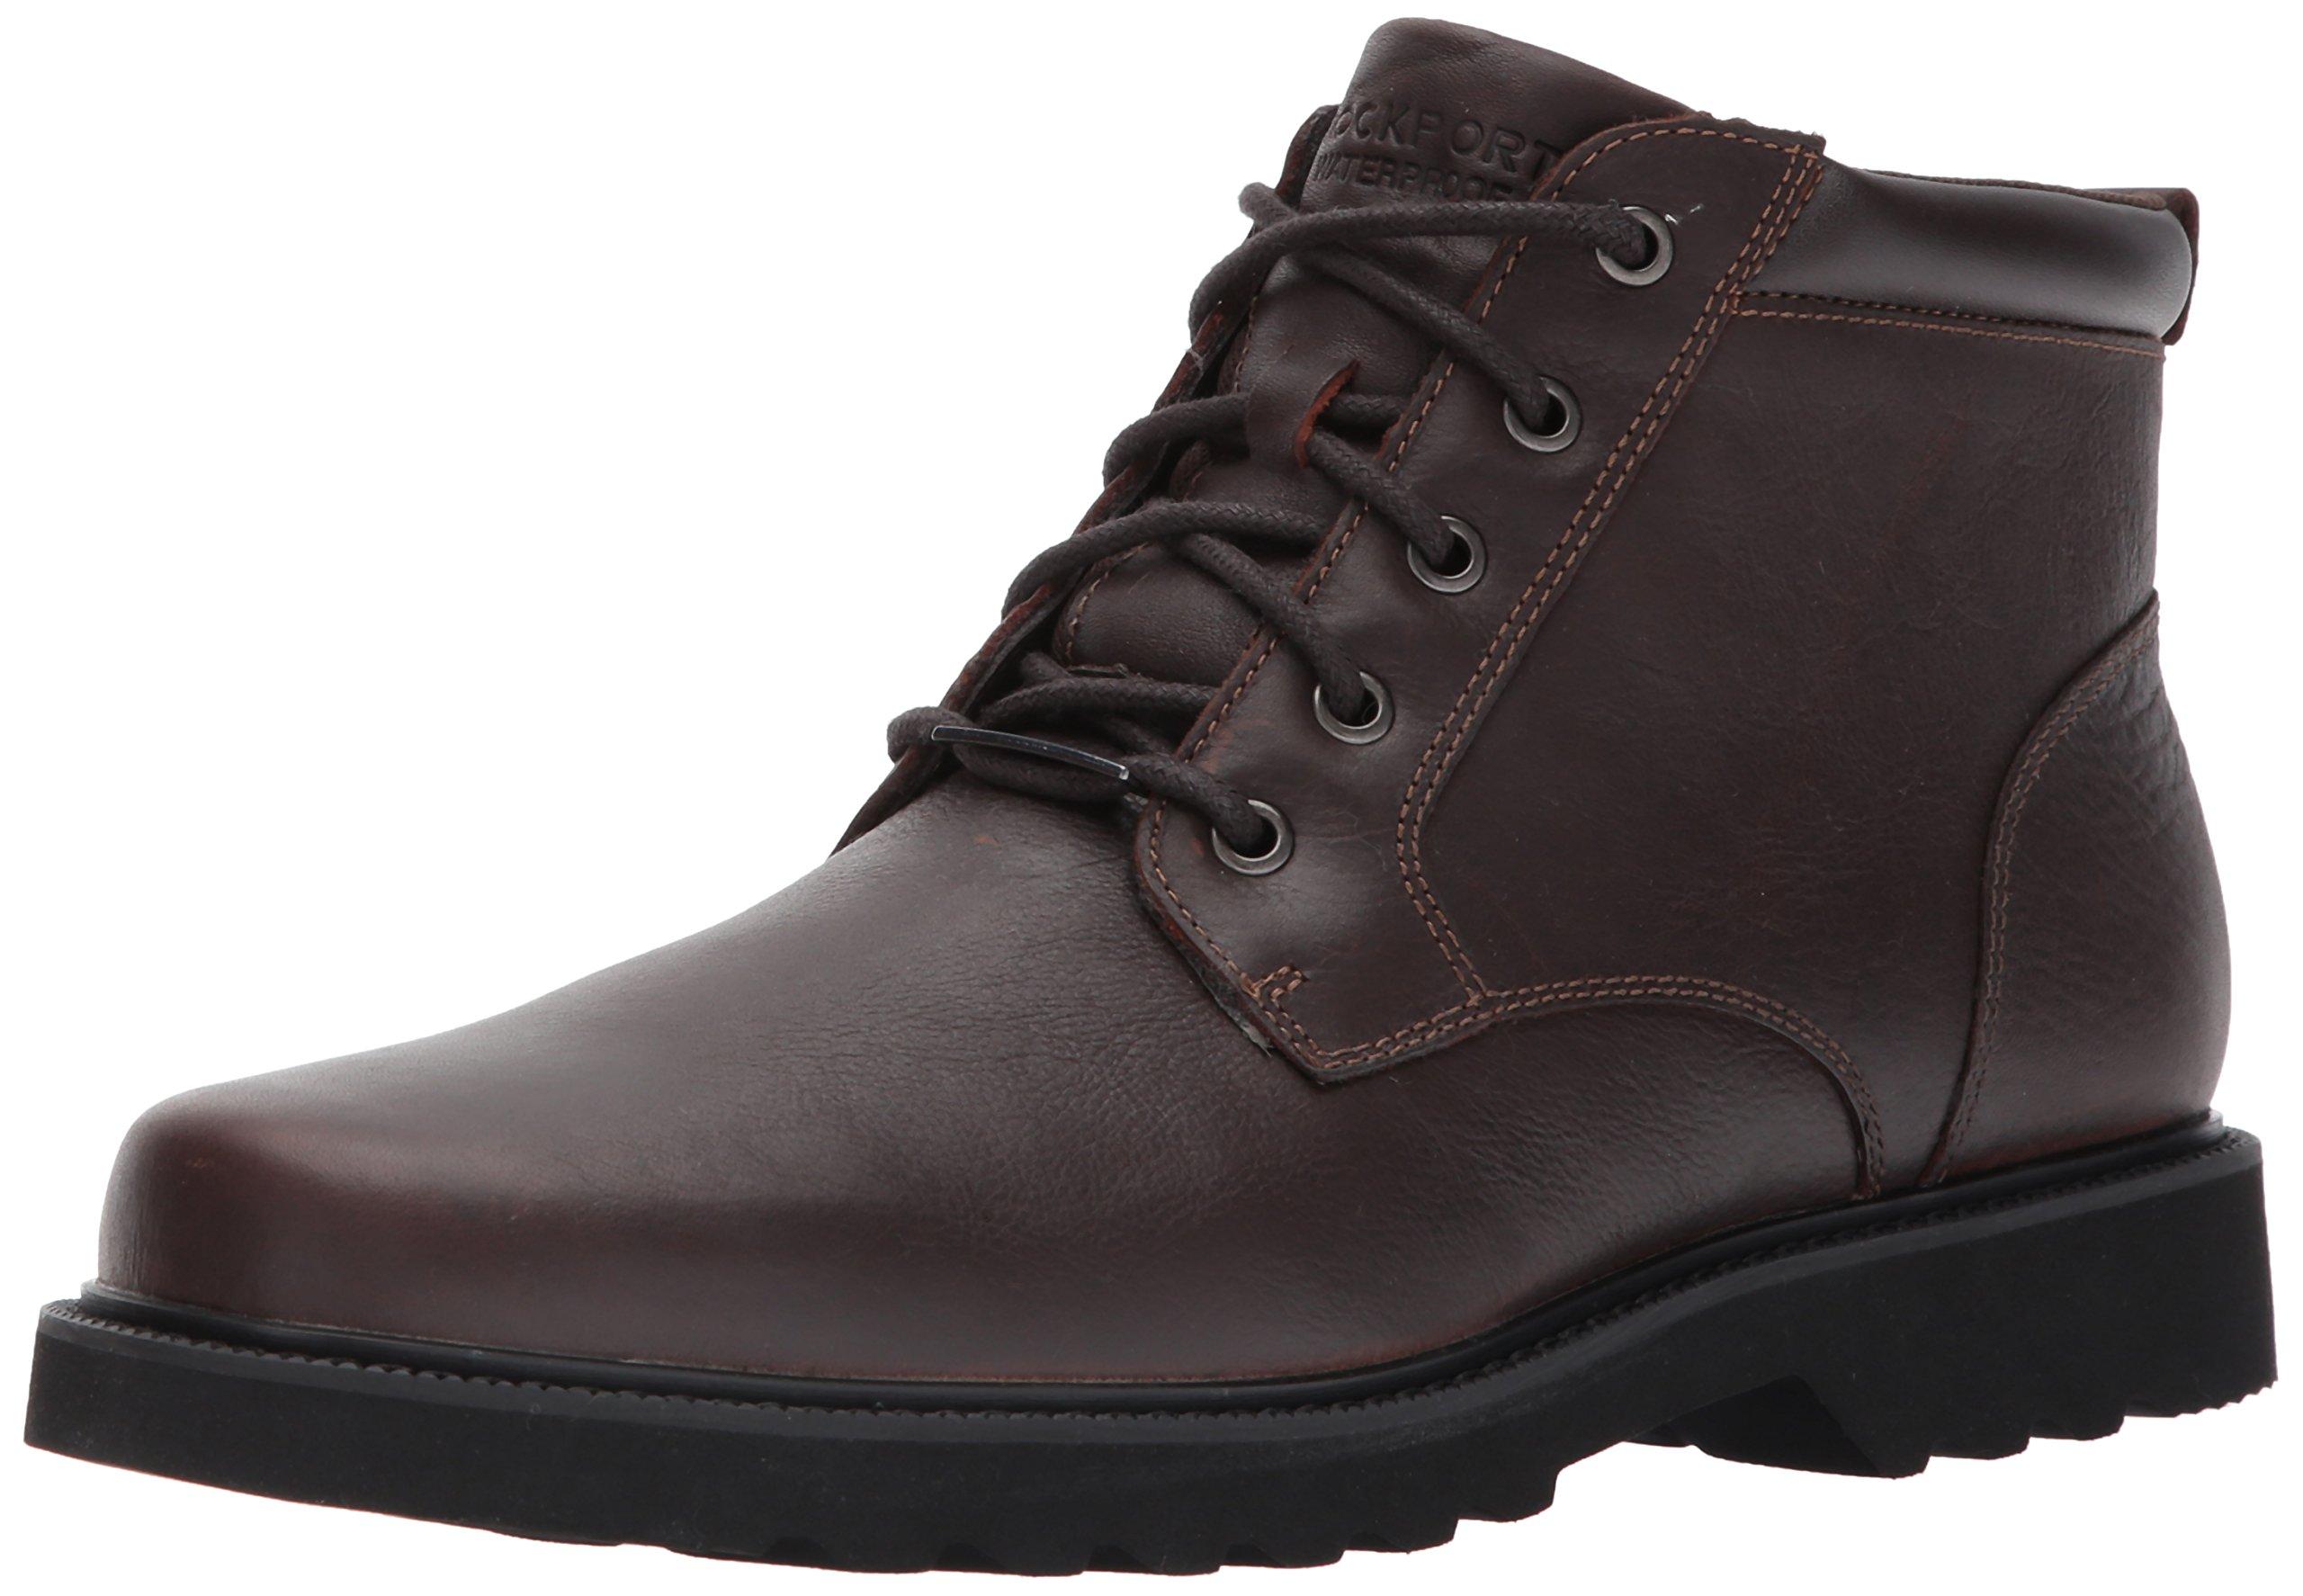 Rockport Men's Northfield WP Plain Toe Chukka Boot, Chocolate Waterproof, 10.5 XW US